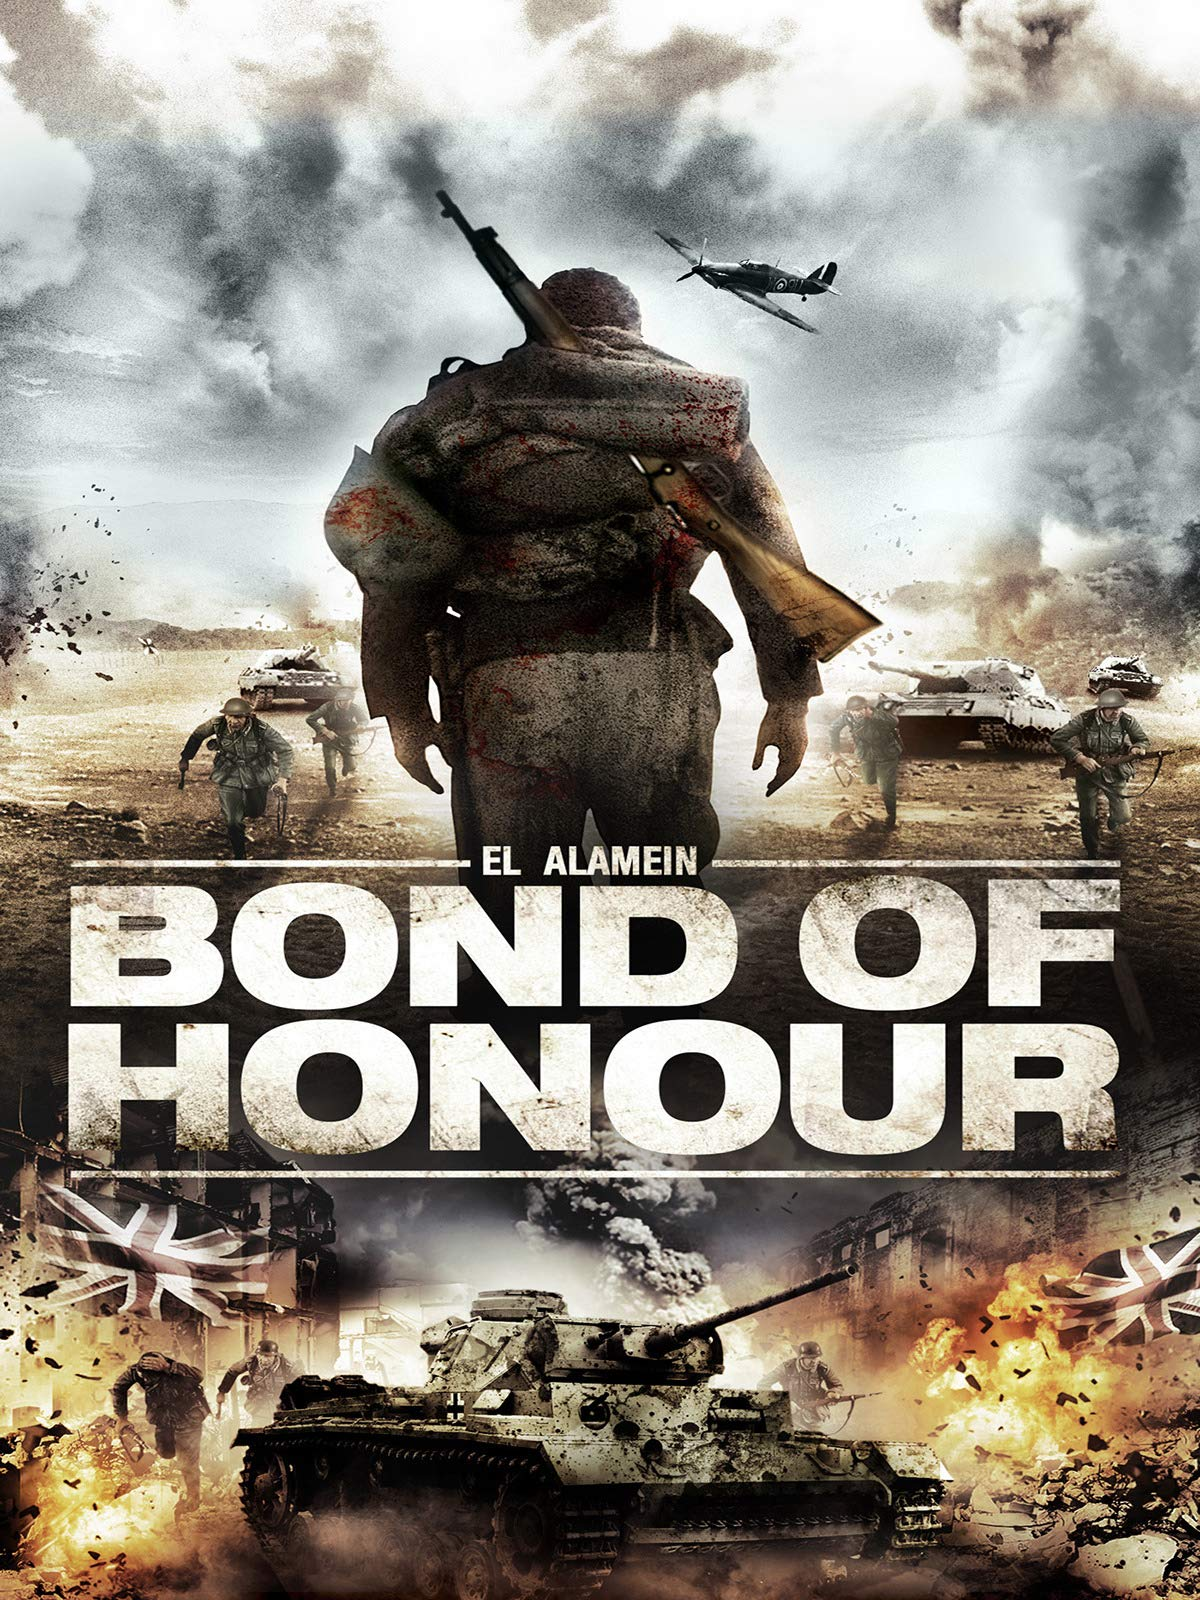 El Alamein: Bond Of Honour